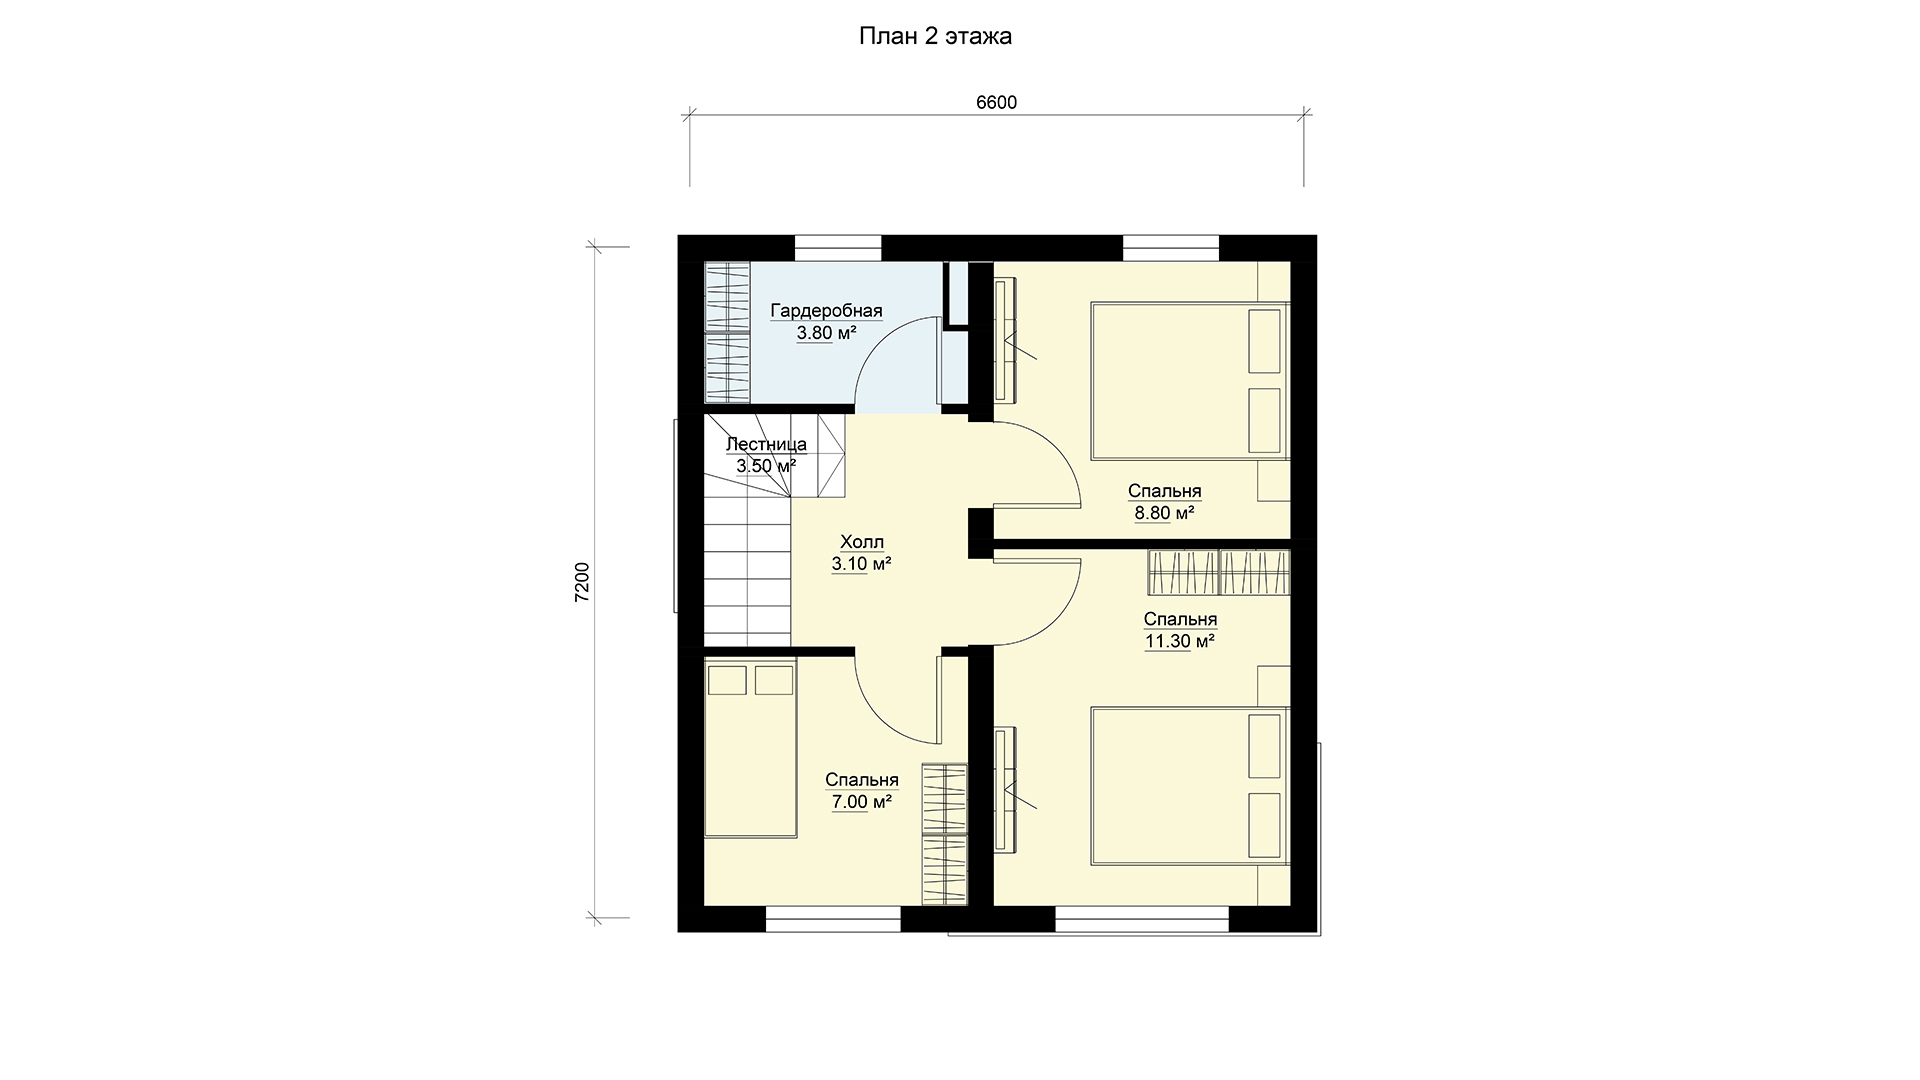 План мансардного этажа дома 6 на 7 двухэтажного, проект БЭНПАН МС-95/1.